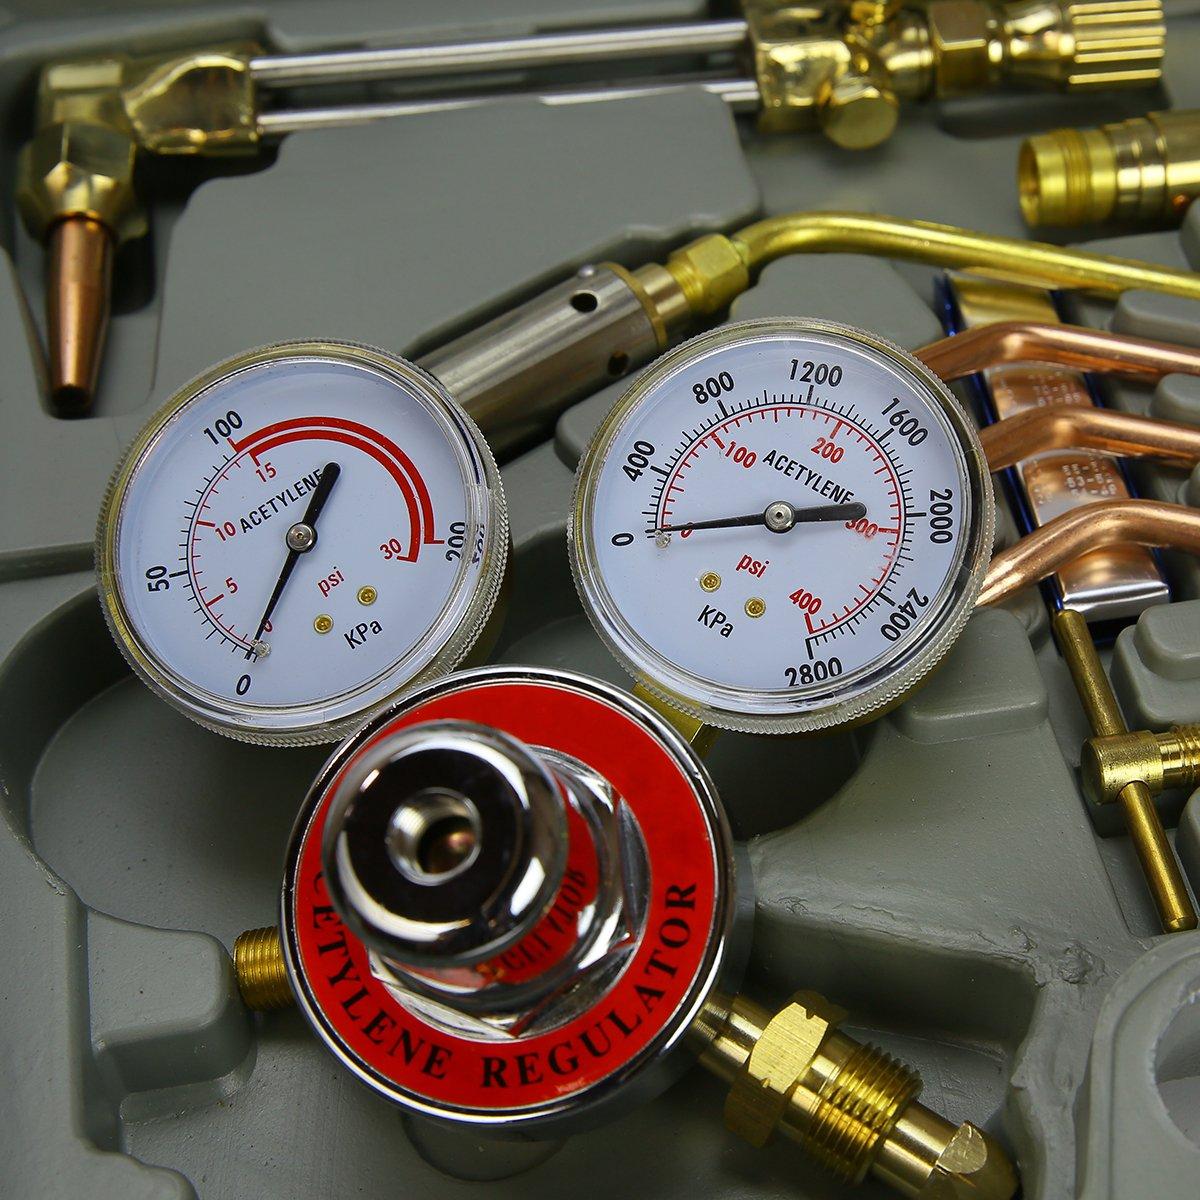 XtremepowerUS''Harris'' Type Oxy Acetylene Welding Cutting Torch Kit by XtremepowerUS (Image #2)